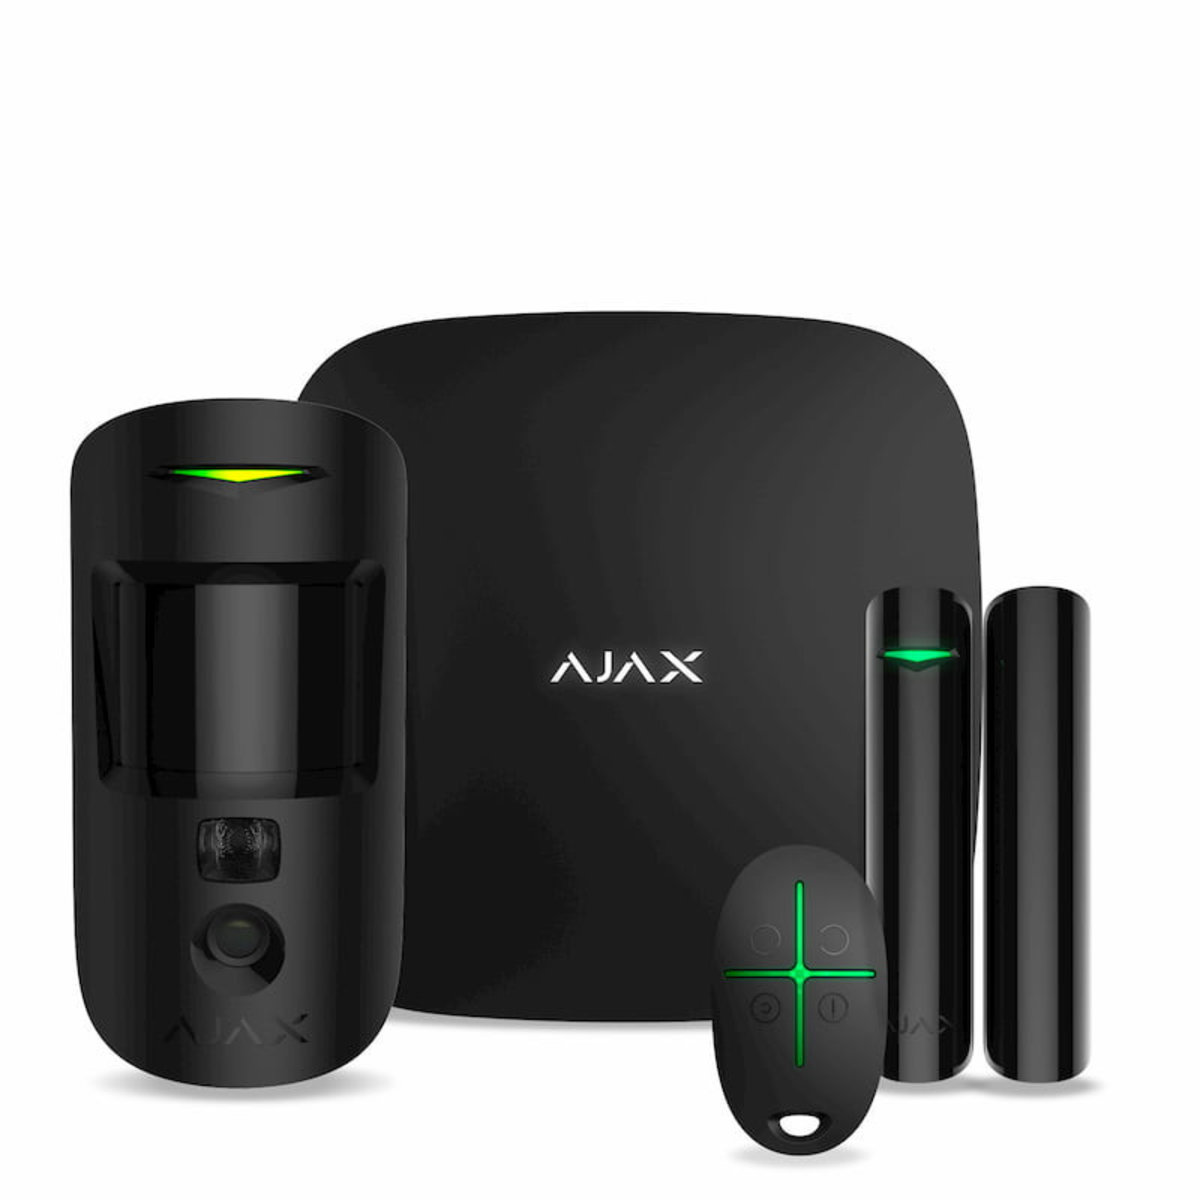 Ajax, StarterKit Cam black EU комплект охоронної сигналізації